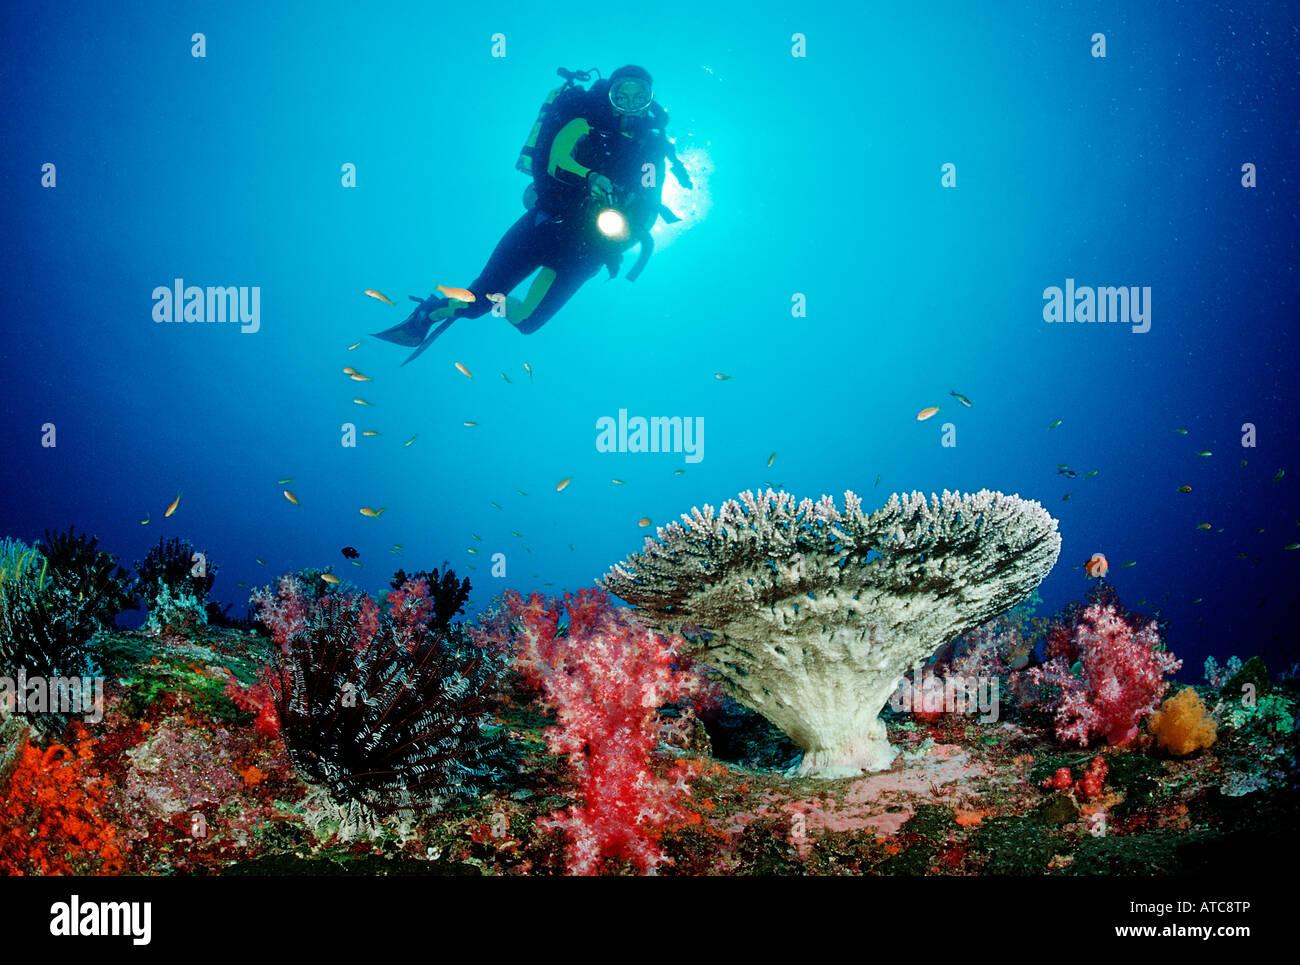 Coral Reef e subacqueo Isole Similan Thailandia Immagini Stock